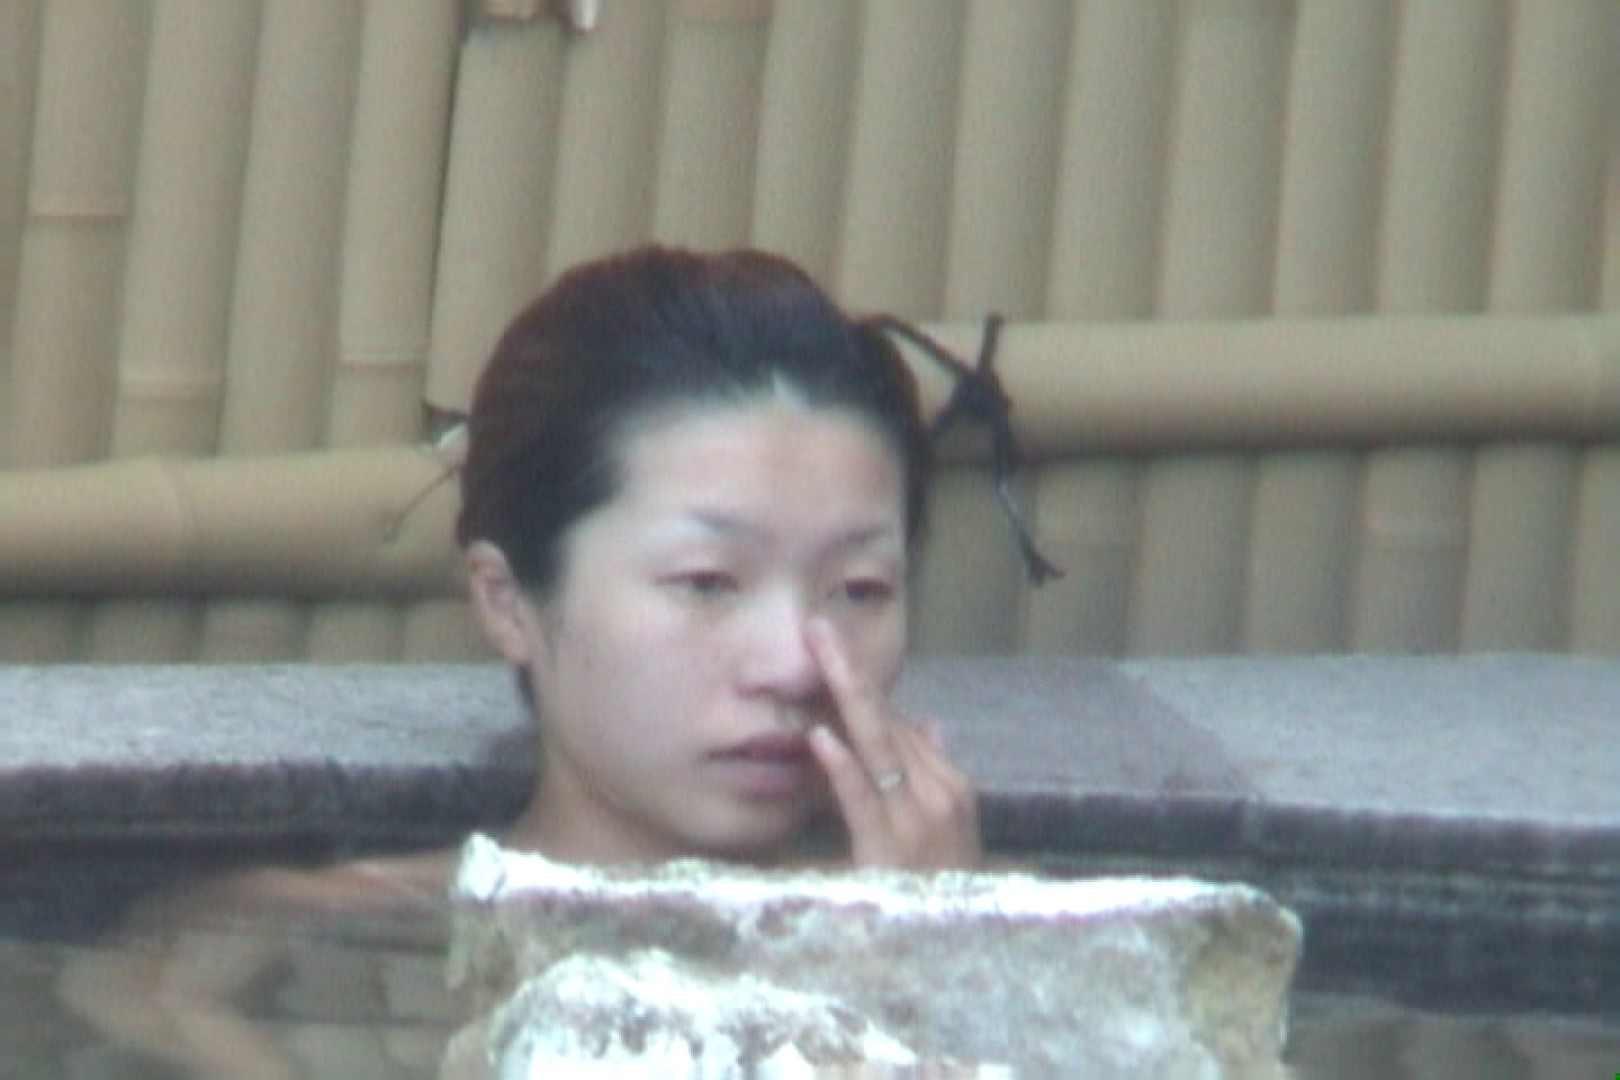 Aquaな露天風呂Vol.571 盗撮 | OLセックス  83画像 37